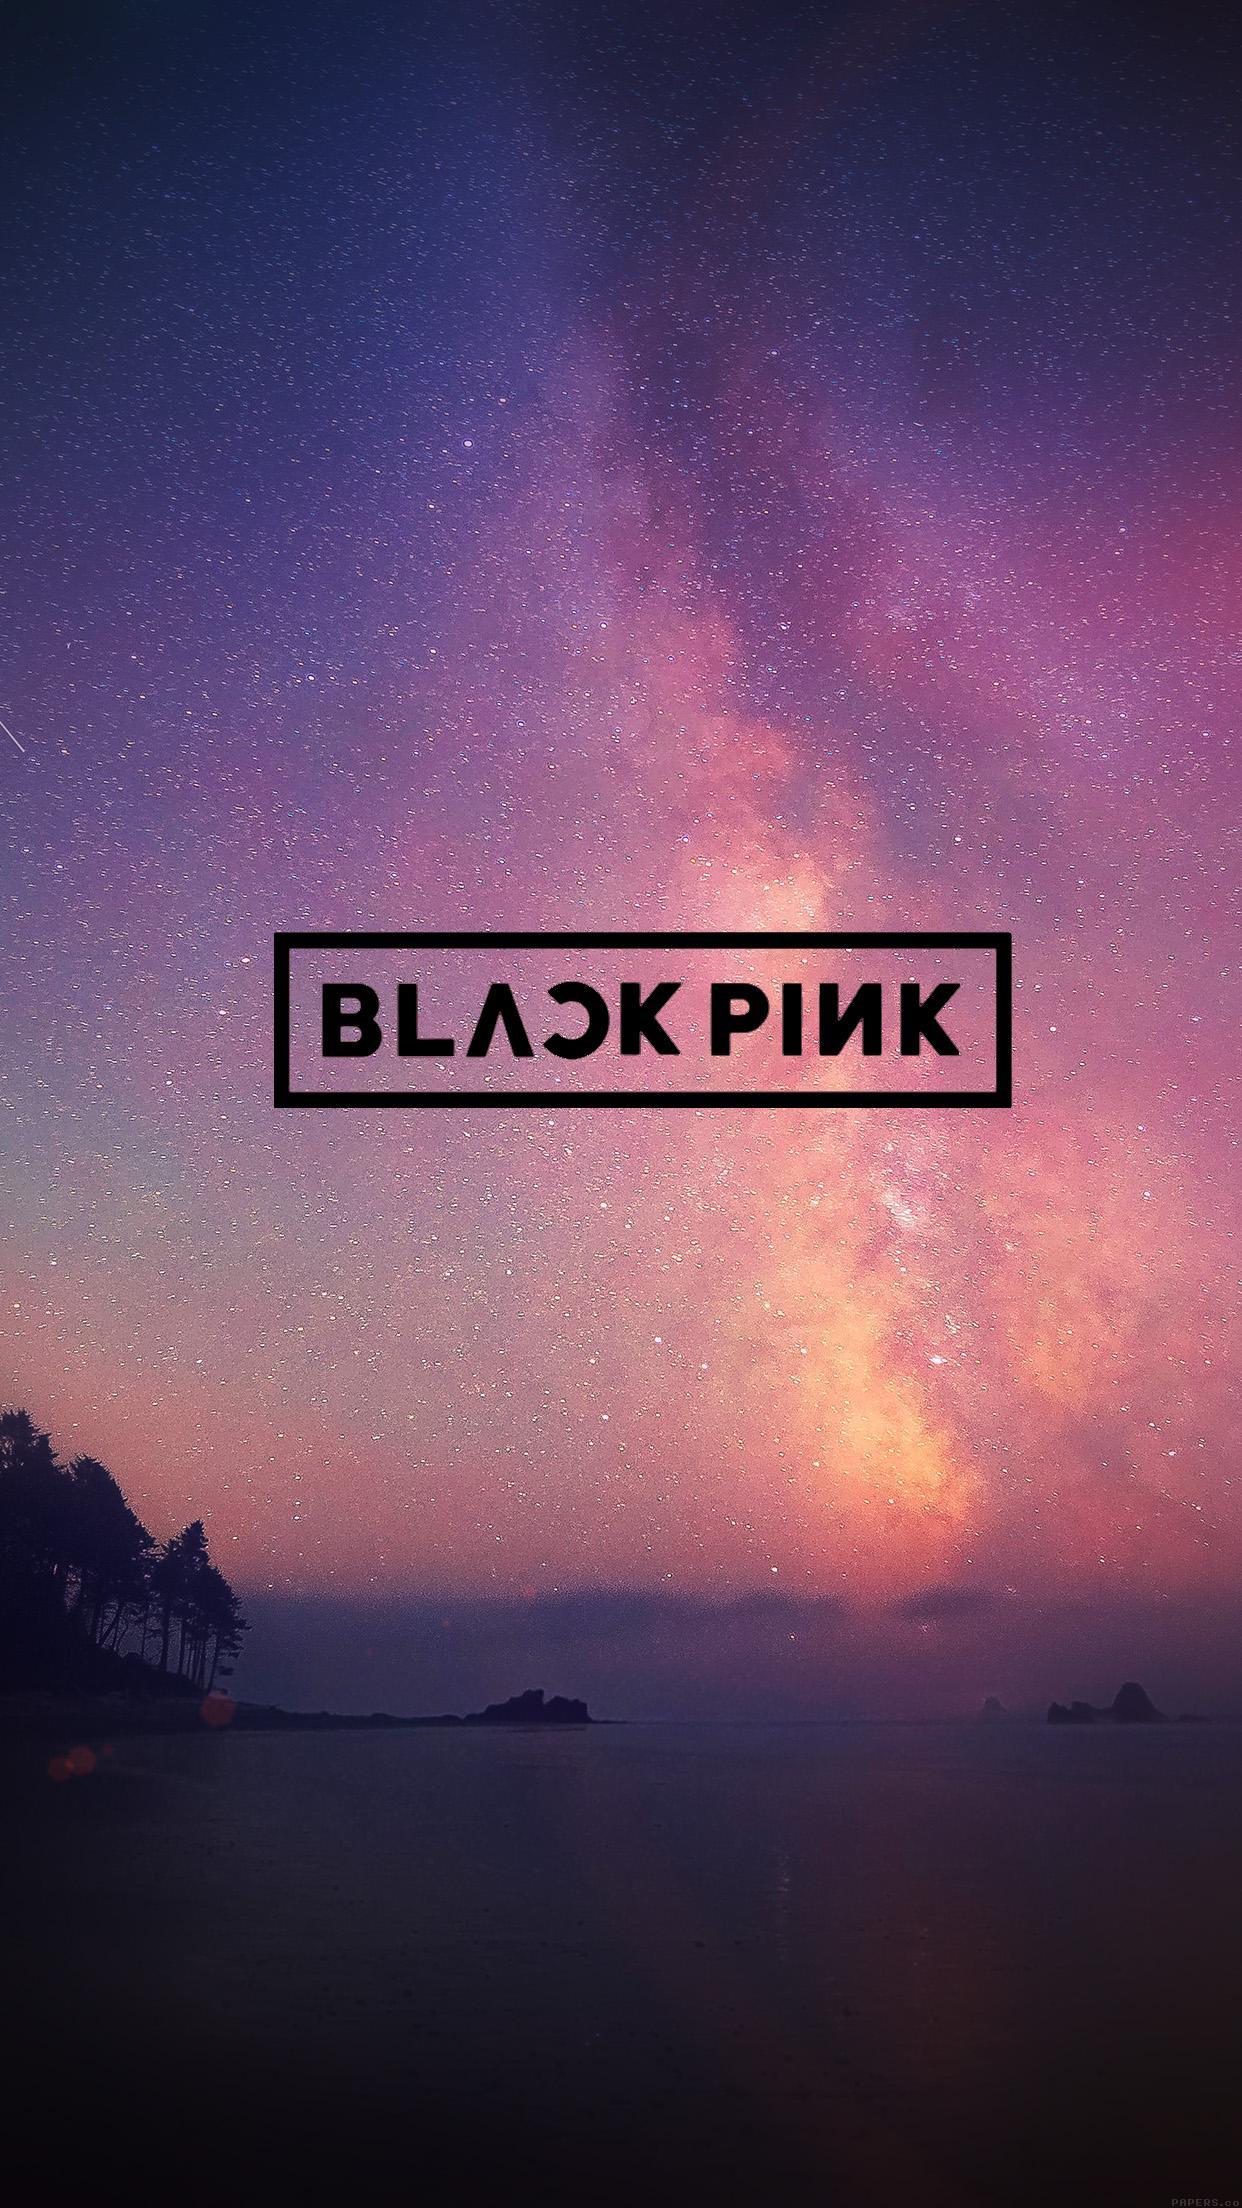 BlackPink Logo Phone Wallpaper   Album on Imgur 1242x2208